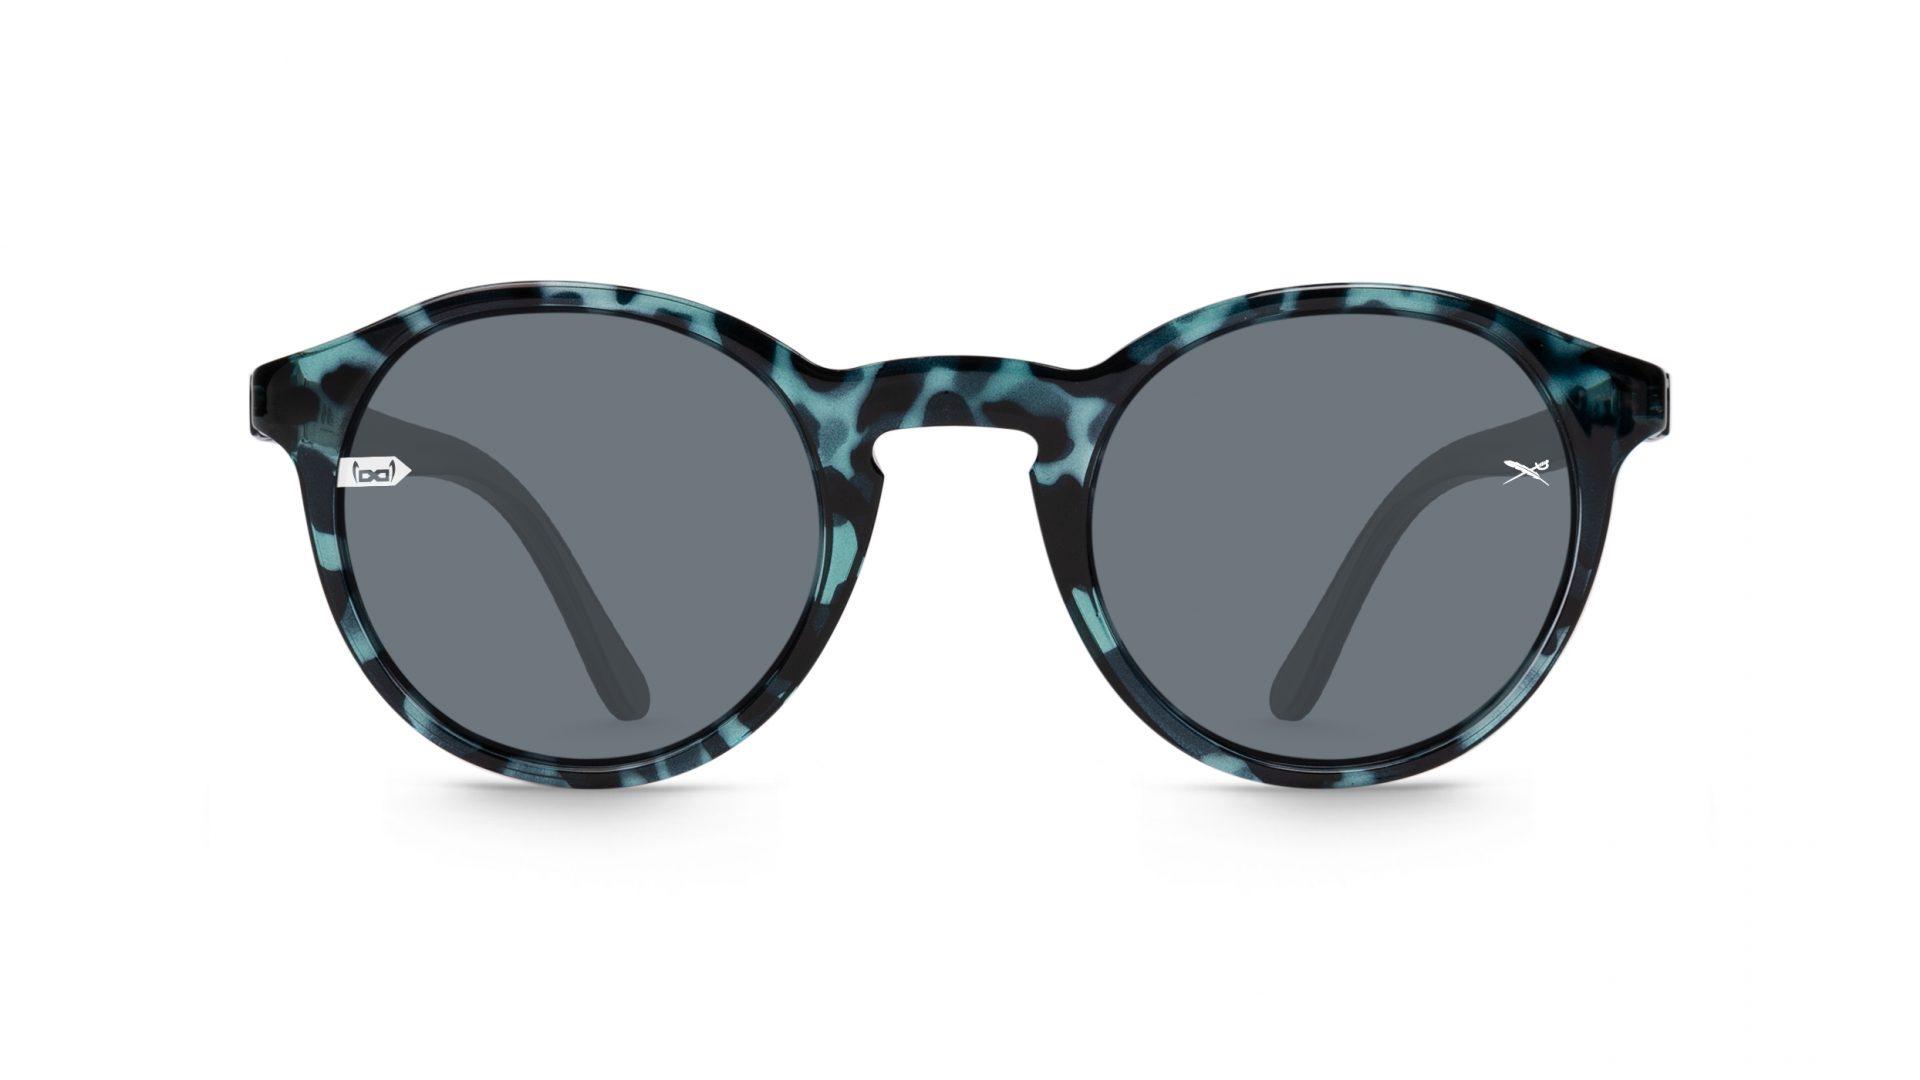 Gloryfy 2020 Sunglasses